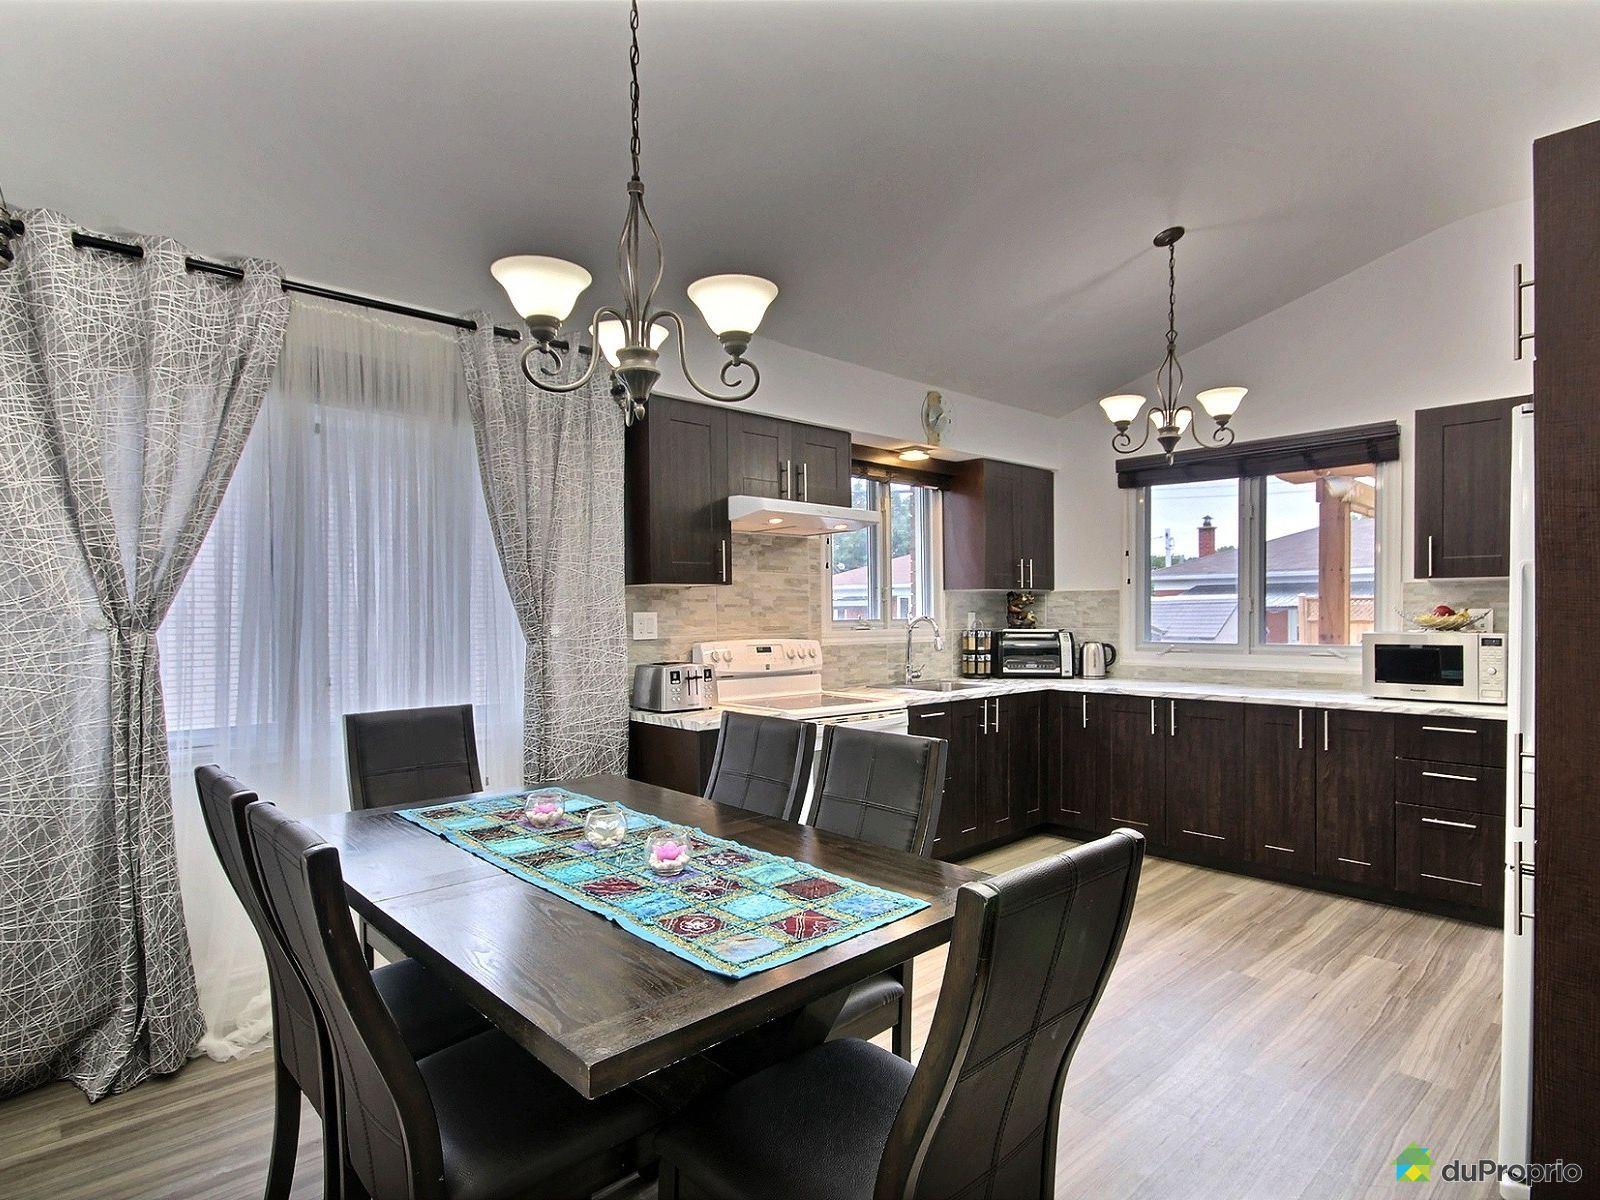 Maison à vendre duvernay, 554 rue notre dame de fatima, immobilier ...